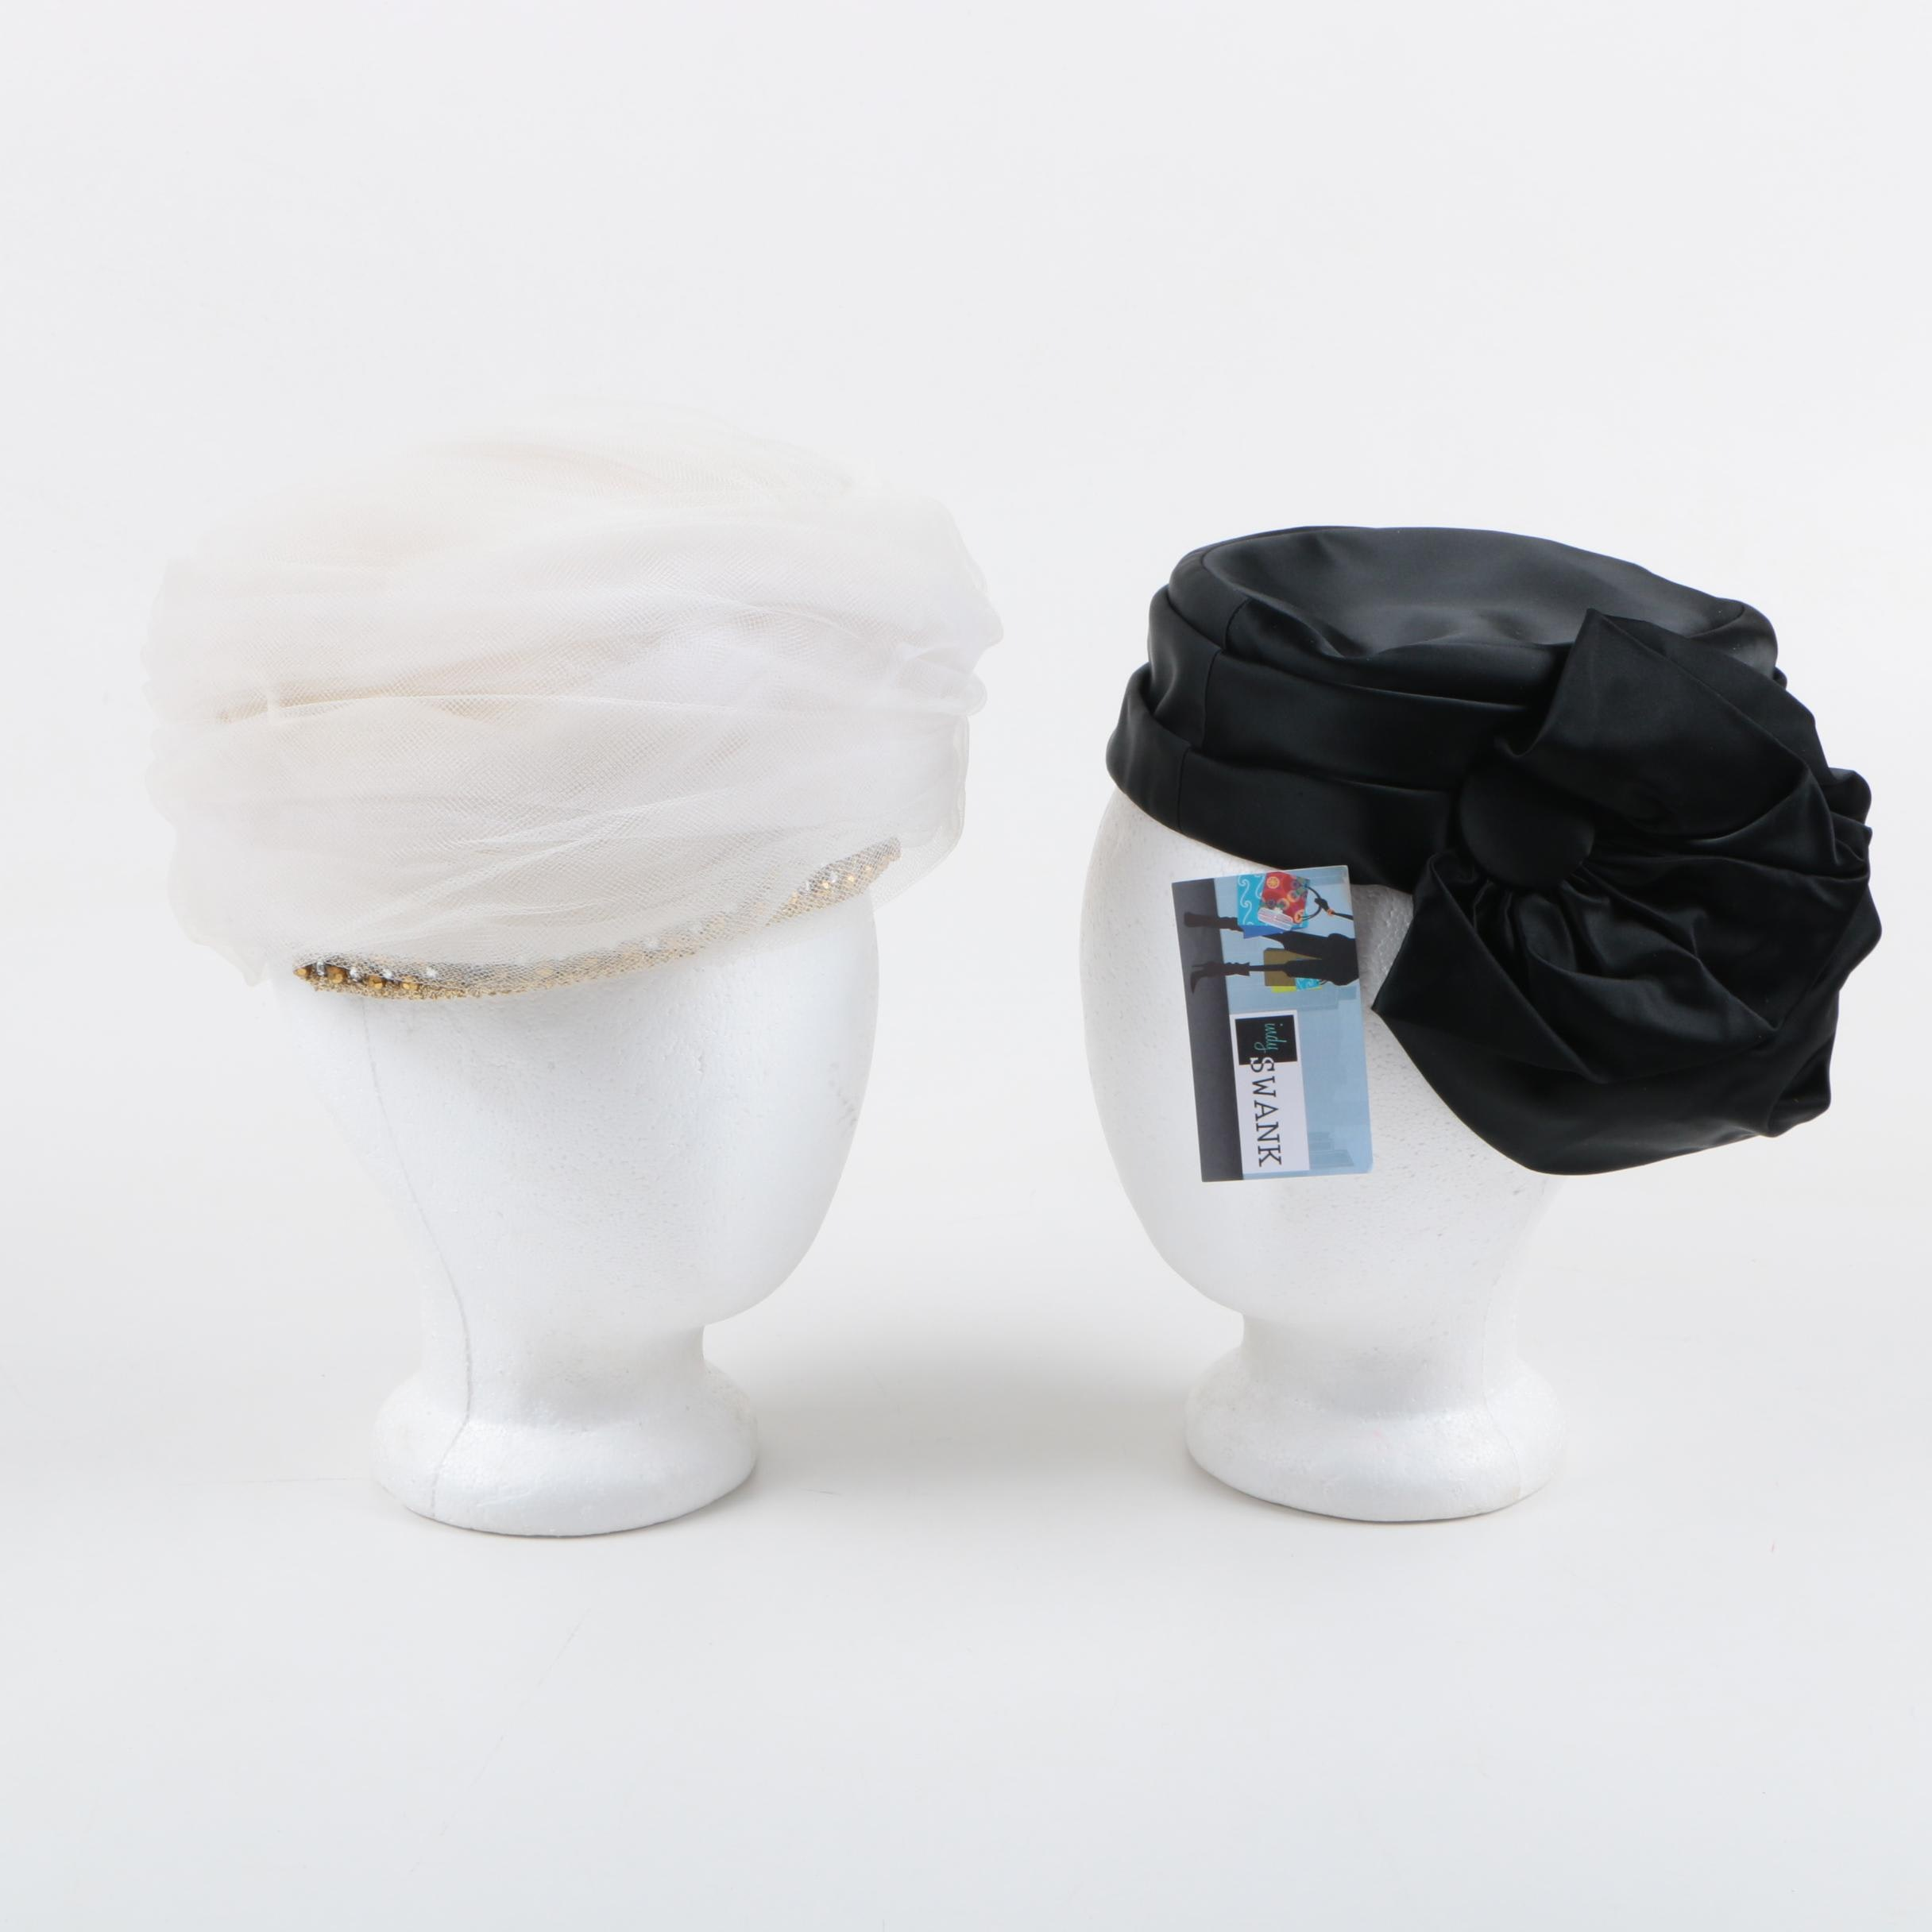 Vintage Hats Including Schiaparelli